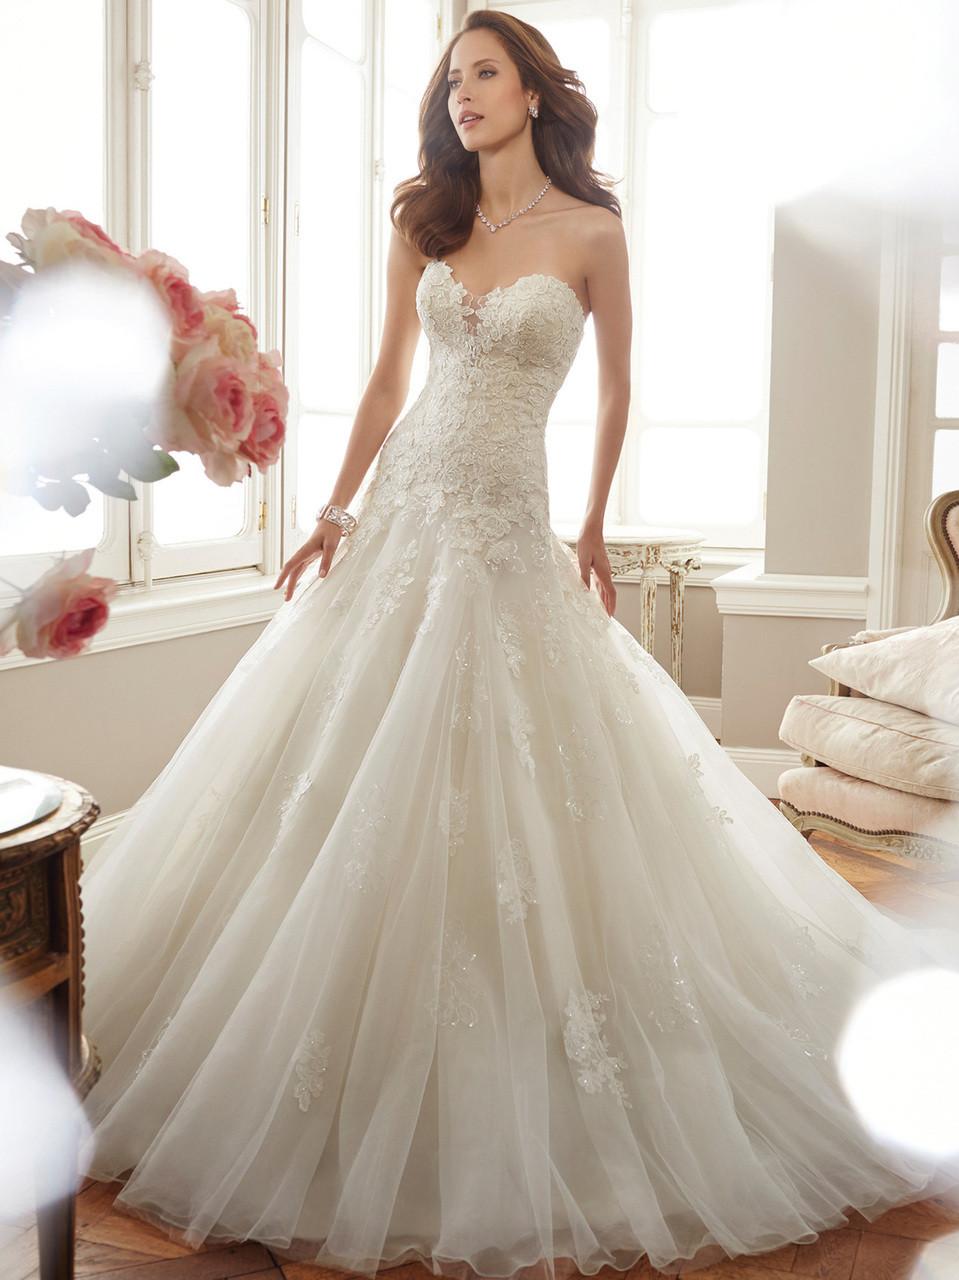 c9e0bd0f4e55 Sophia Tolli Y11715 Sweetheart Fit And Flare Deon Bridal Dress ...